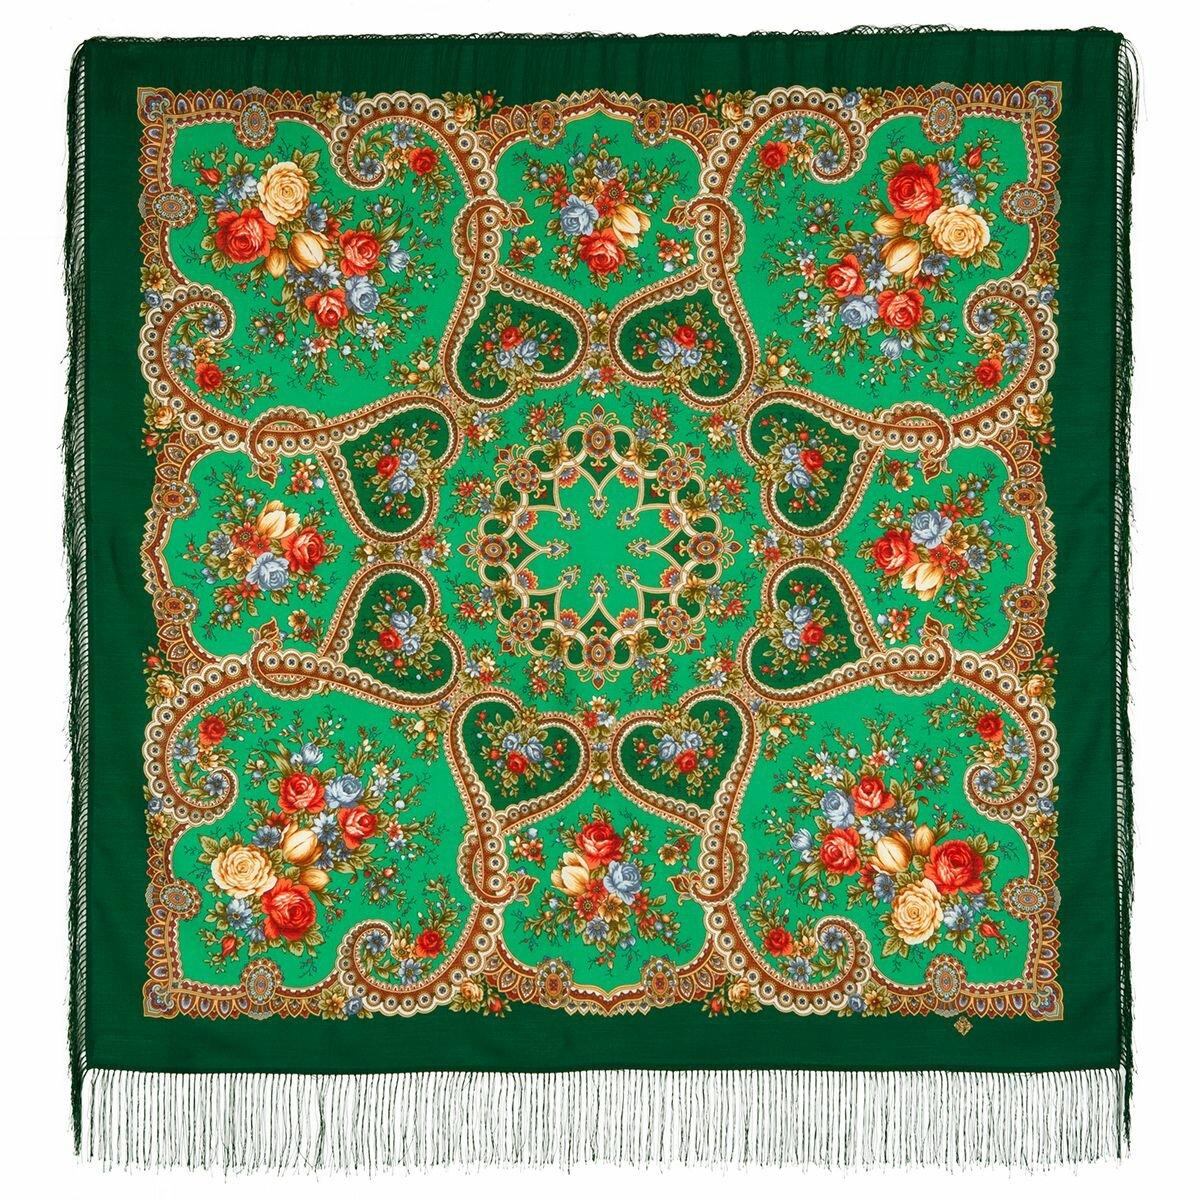 Картинки посадский платок